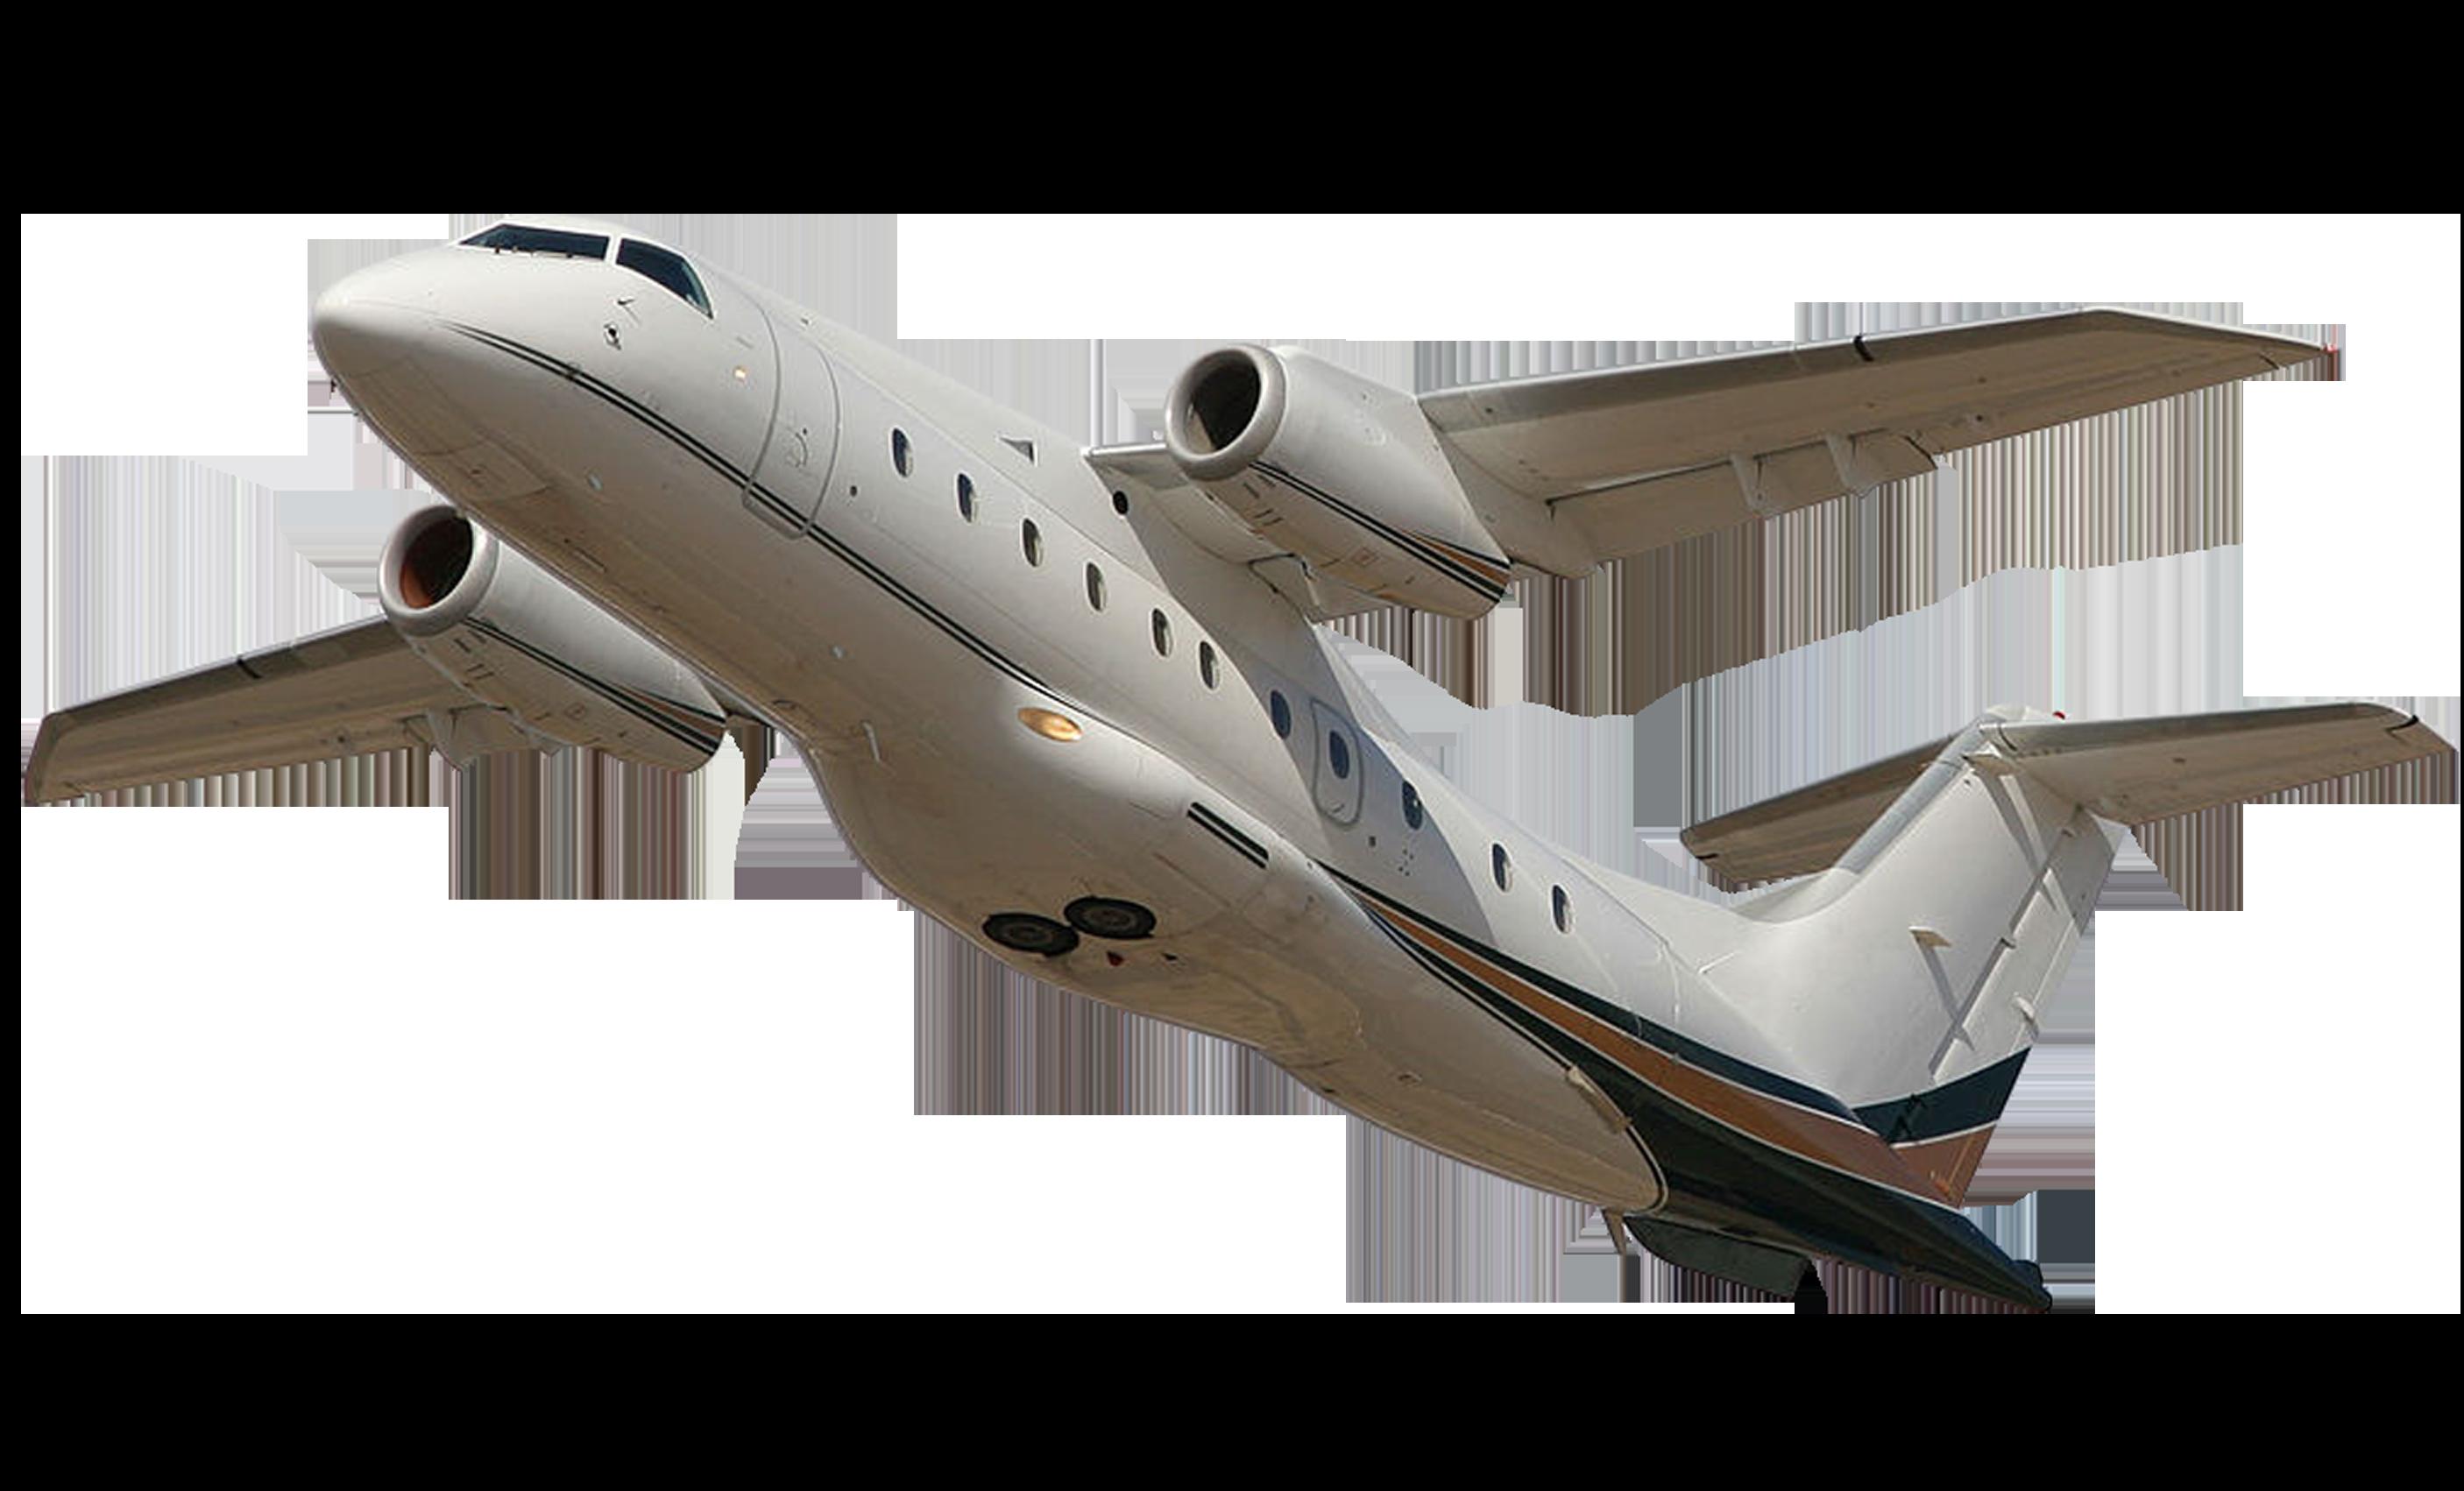 Planes png images free. Clipart plane transparent background